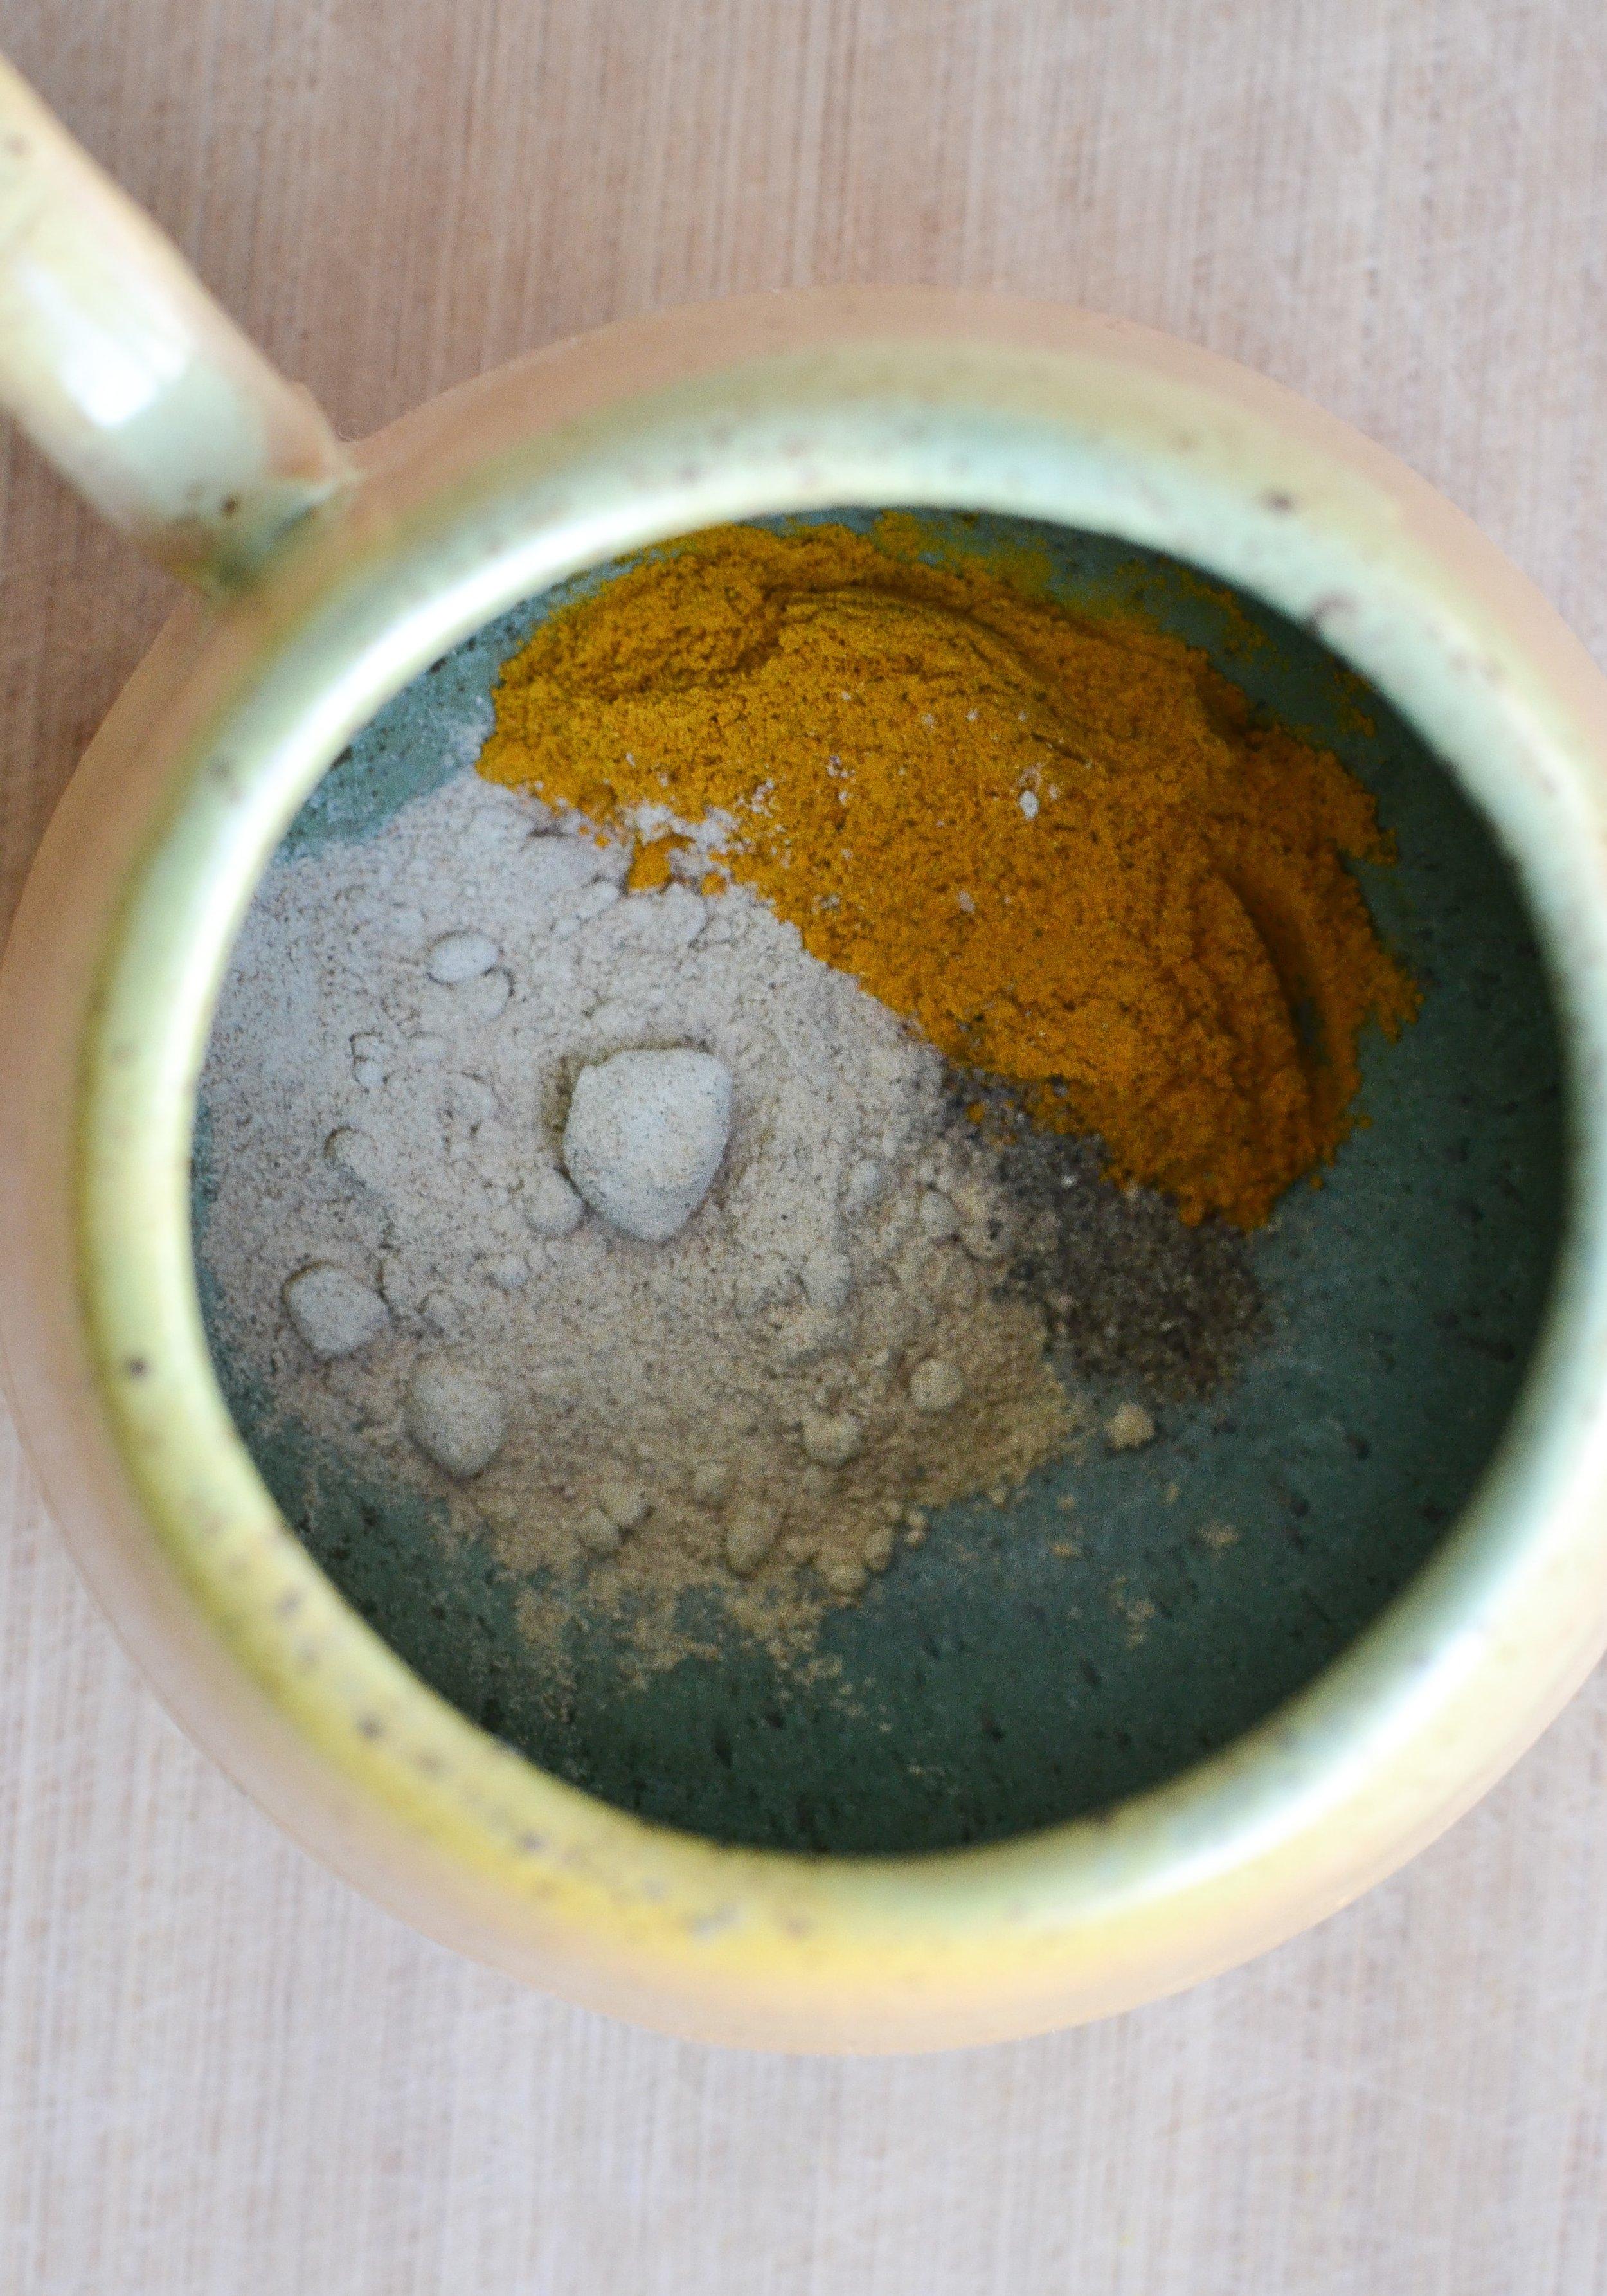 Maca powder, turmeric, and black pepper in mug.